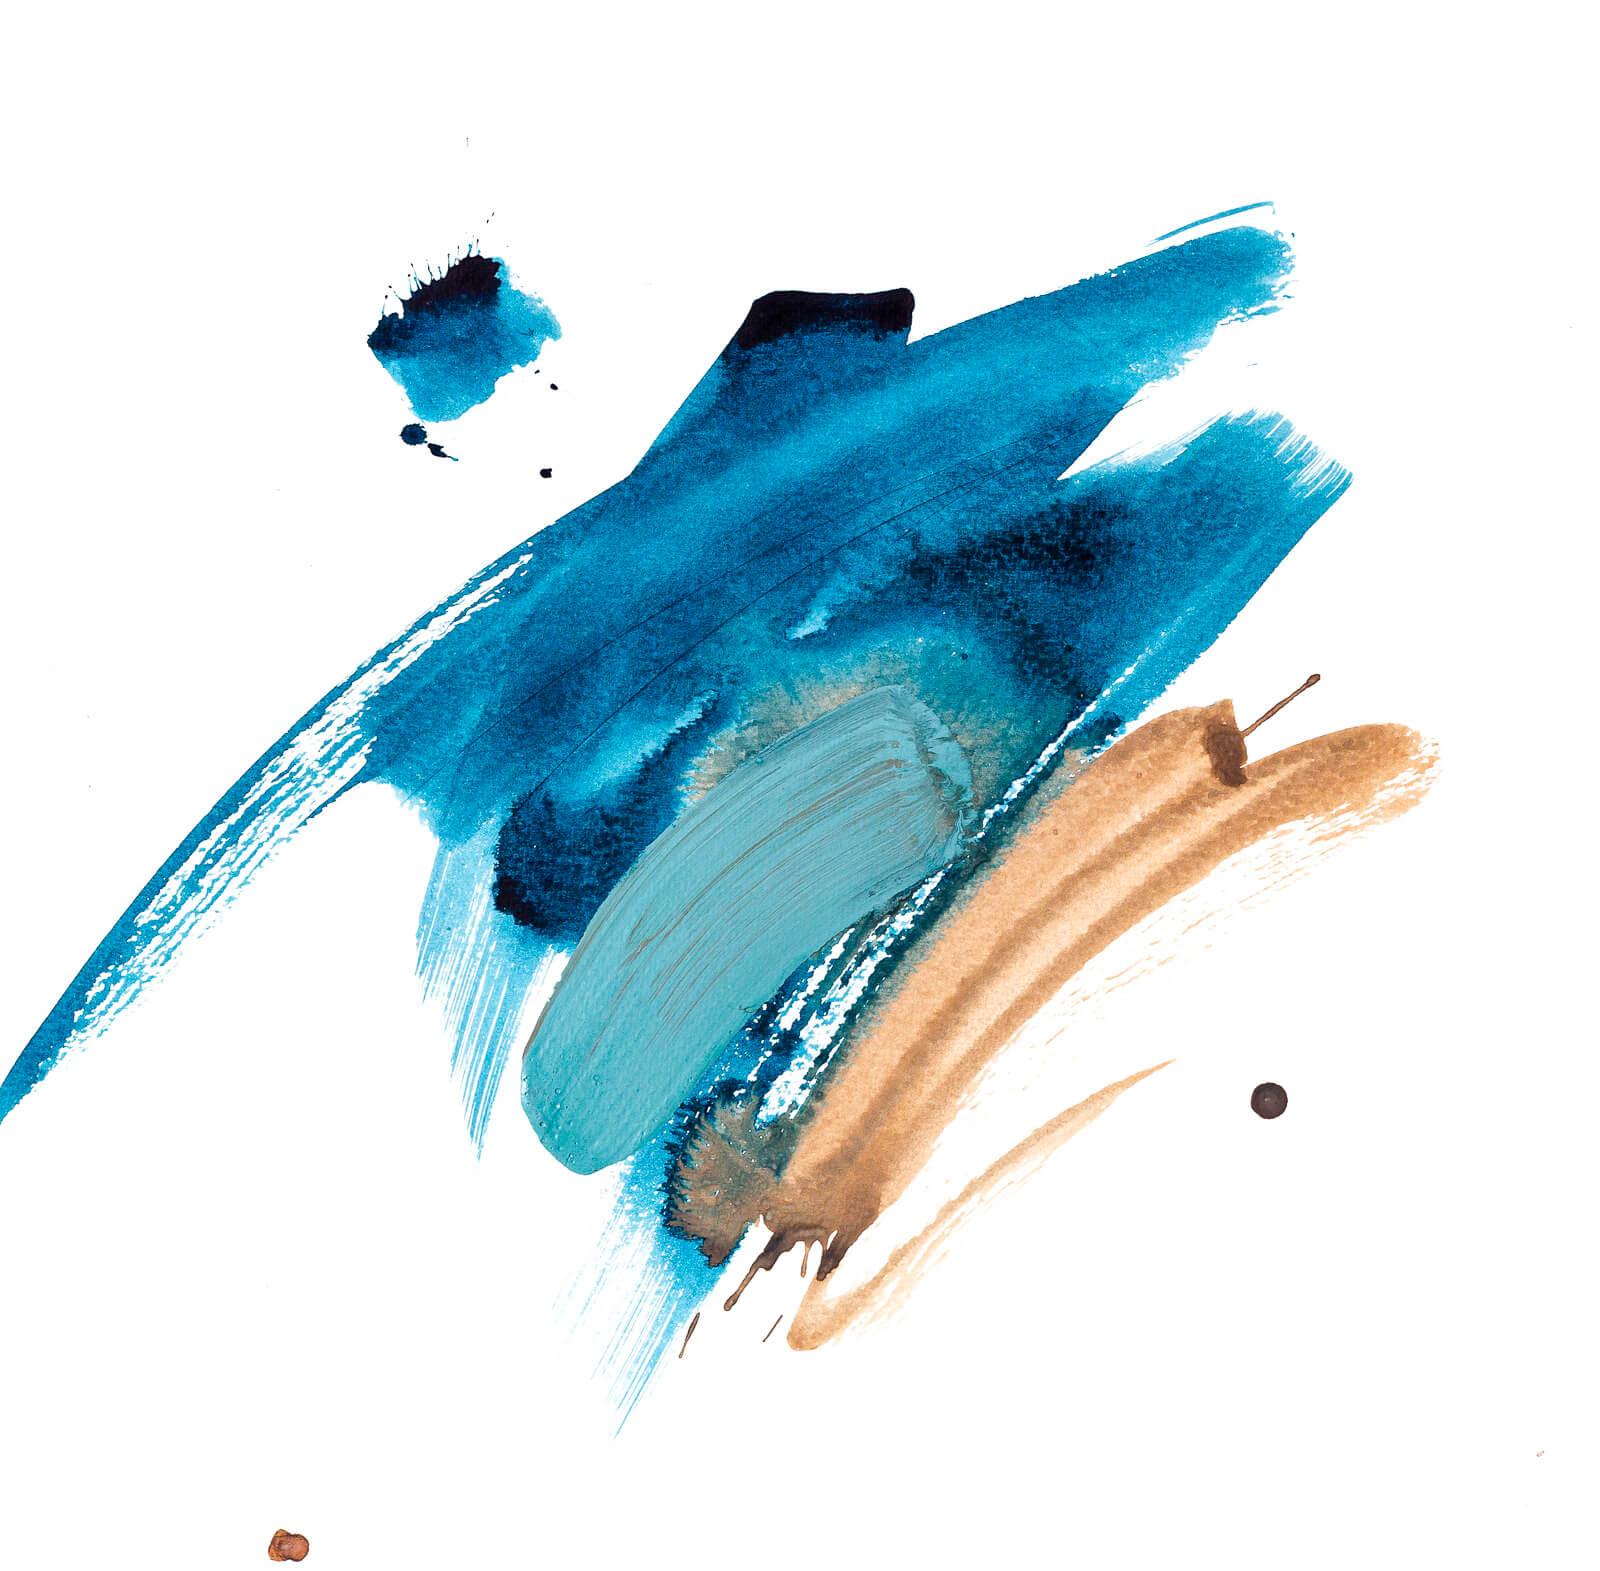 Abstrakts akvarelisAbstrakts akvarelis